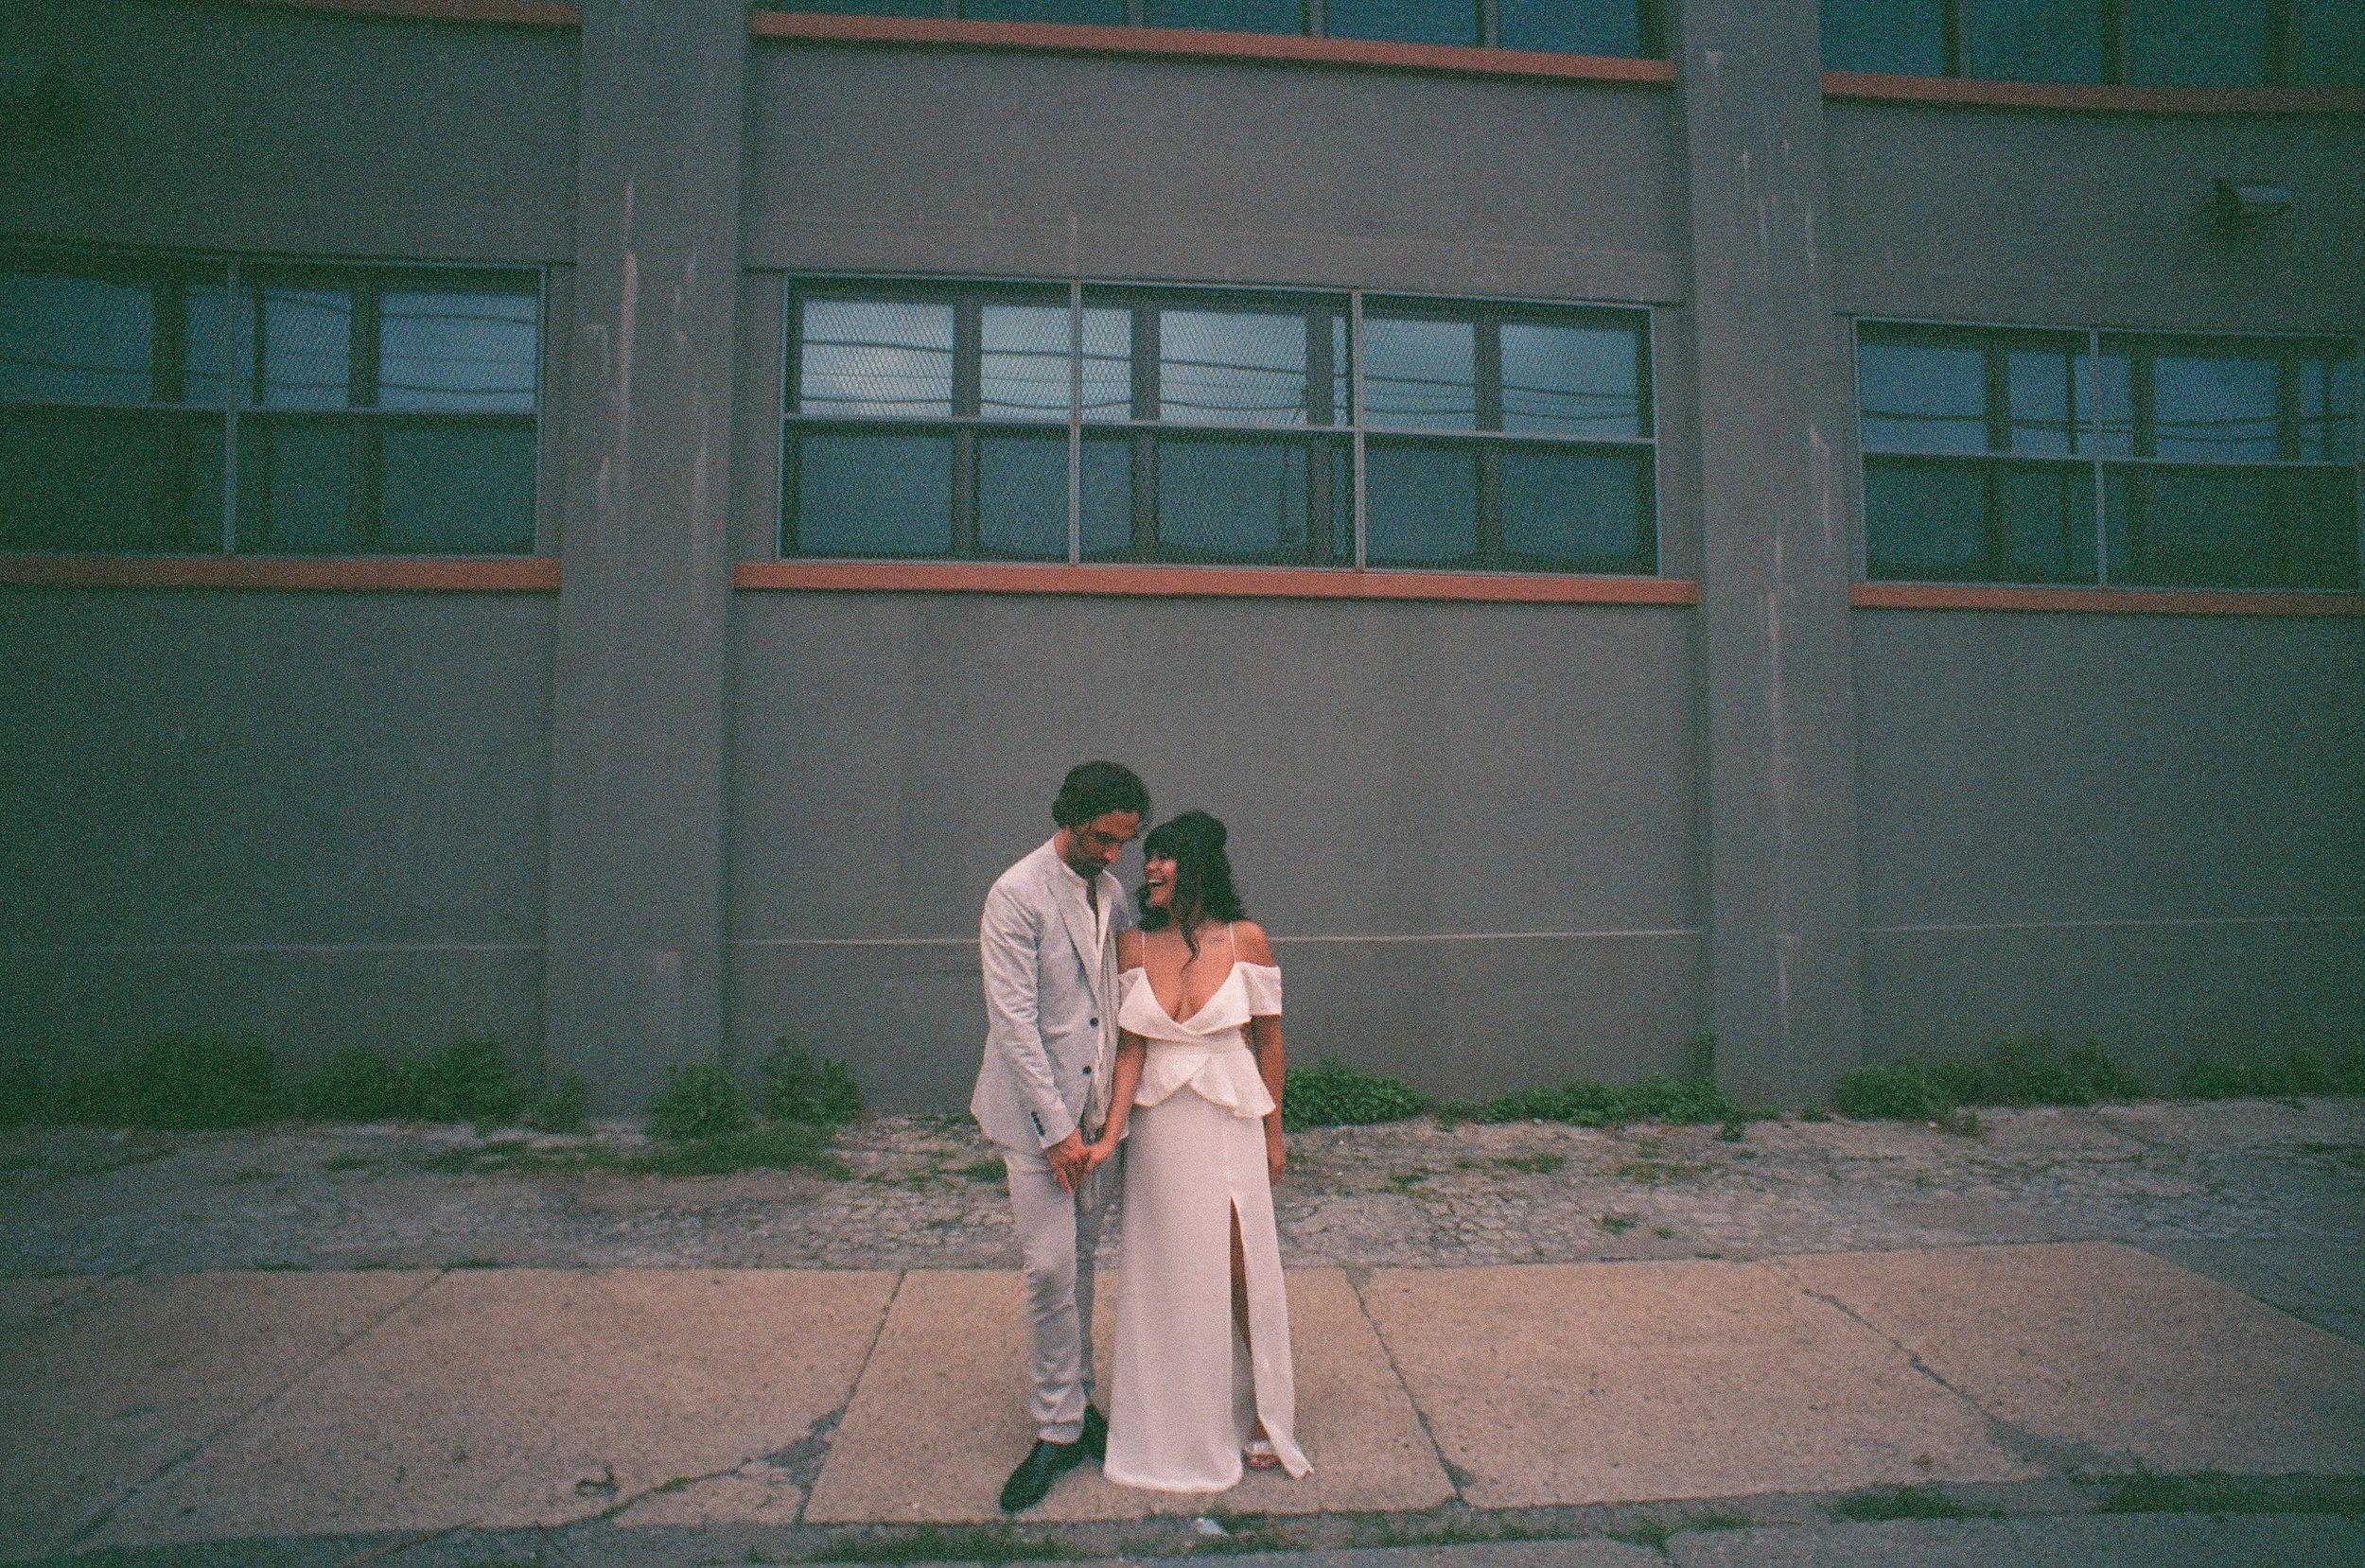 Bushwick_Wedding_Photographer_Film_Chellise_Michael_Photography-12.jpg